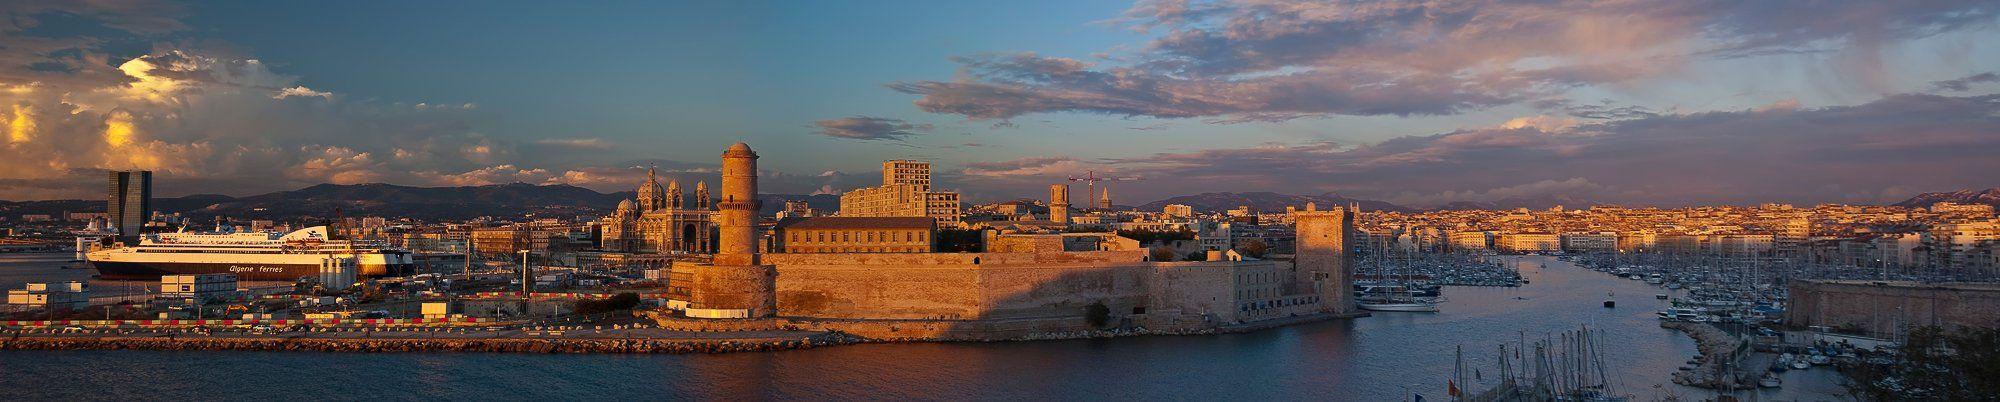 франция, марсель, порт, Александр Беляев